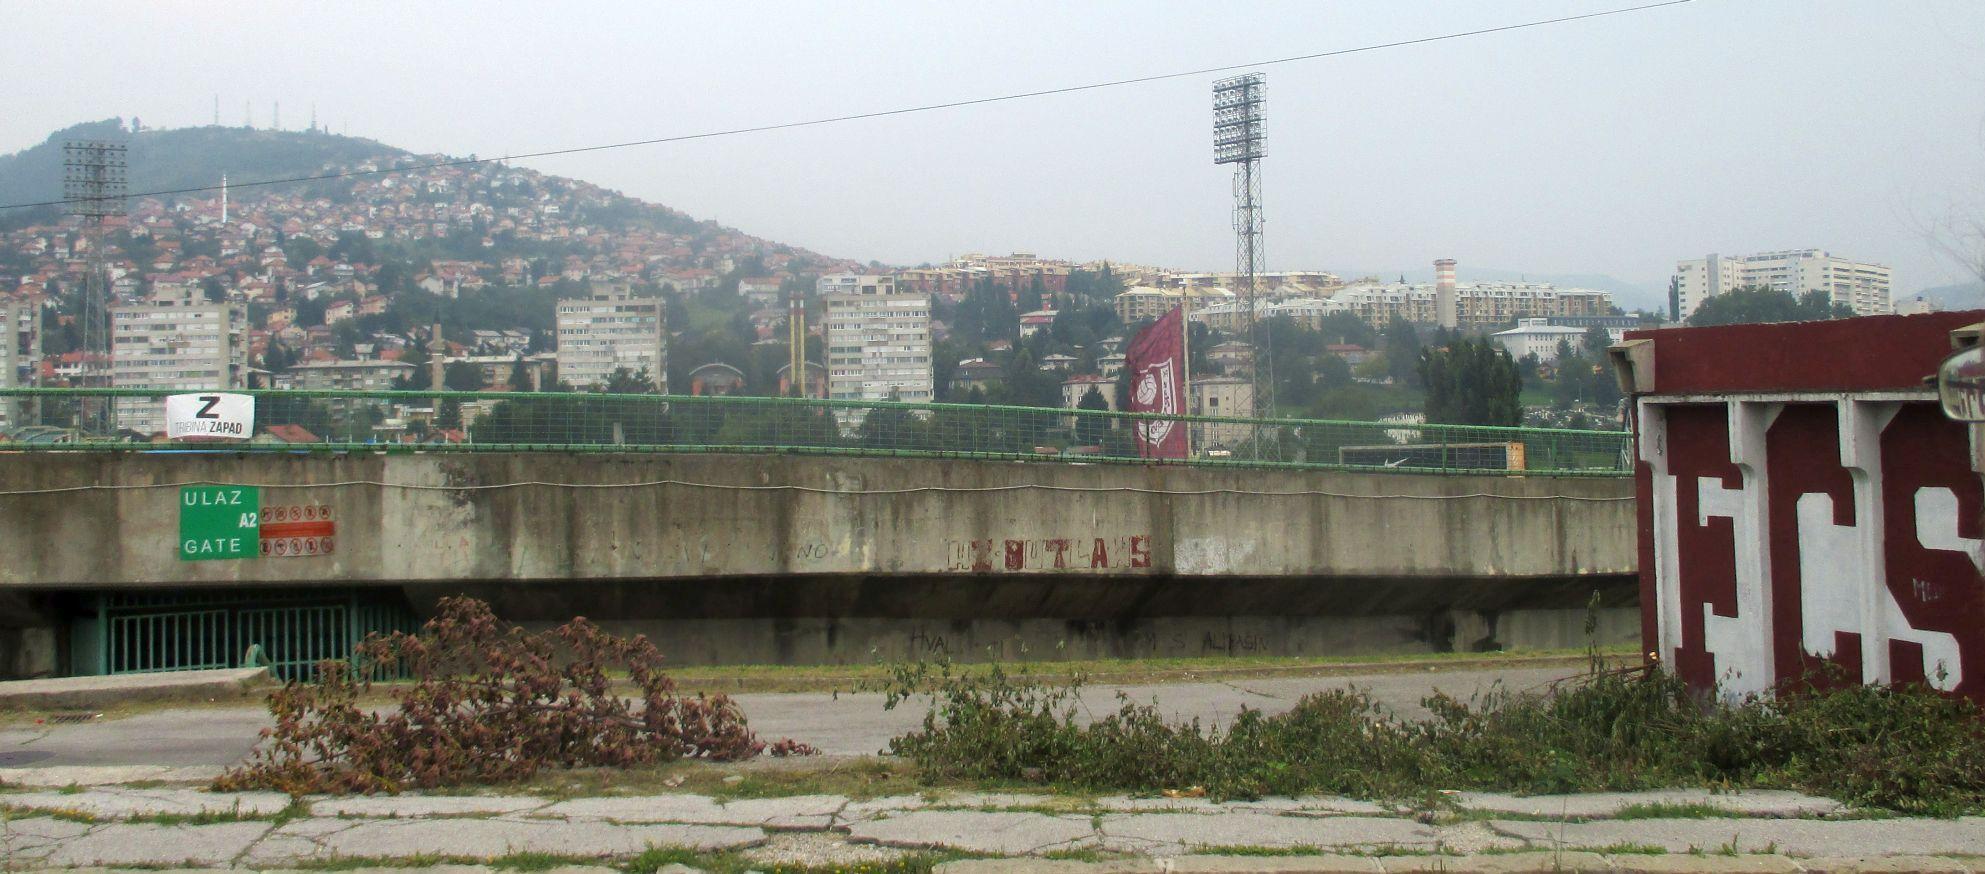 img_3868szarajevostadion.jpg